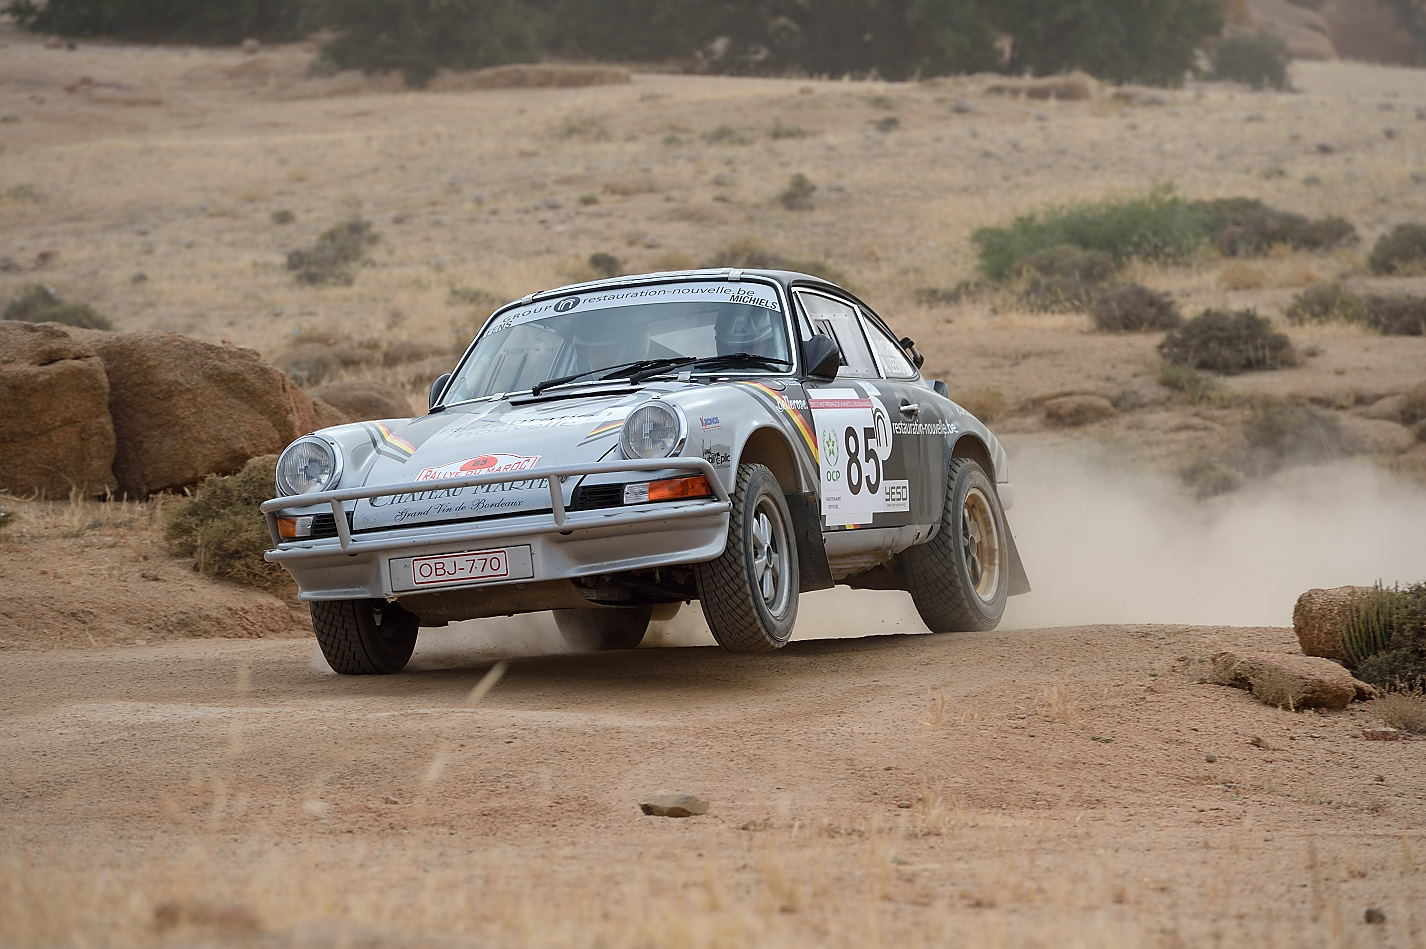 Albert Michiels - Rallye du Maroc Historique 2015